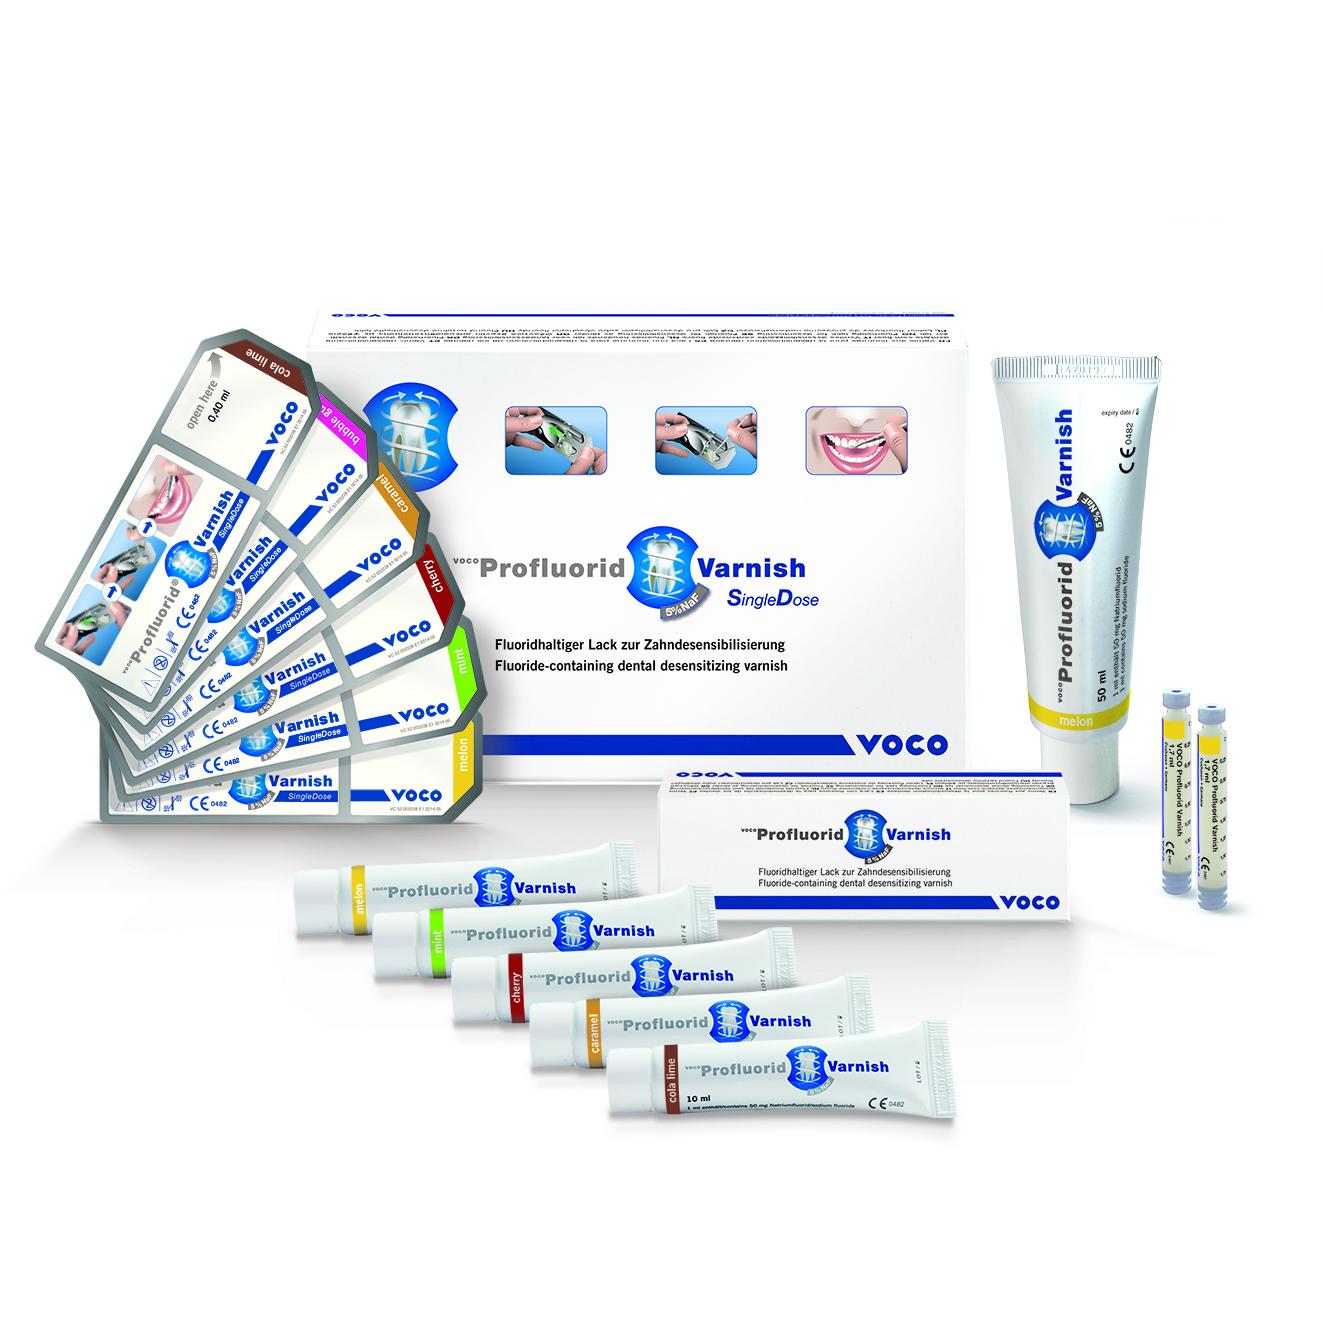 VOCO Profluorid Varnish is ideal for treating hypersensitive teeth.